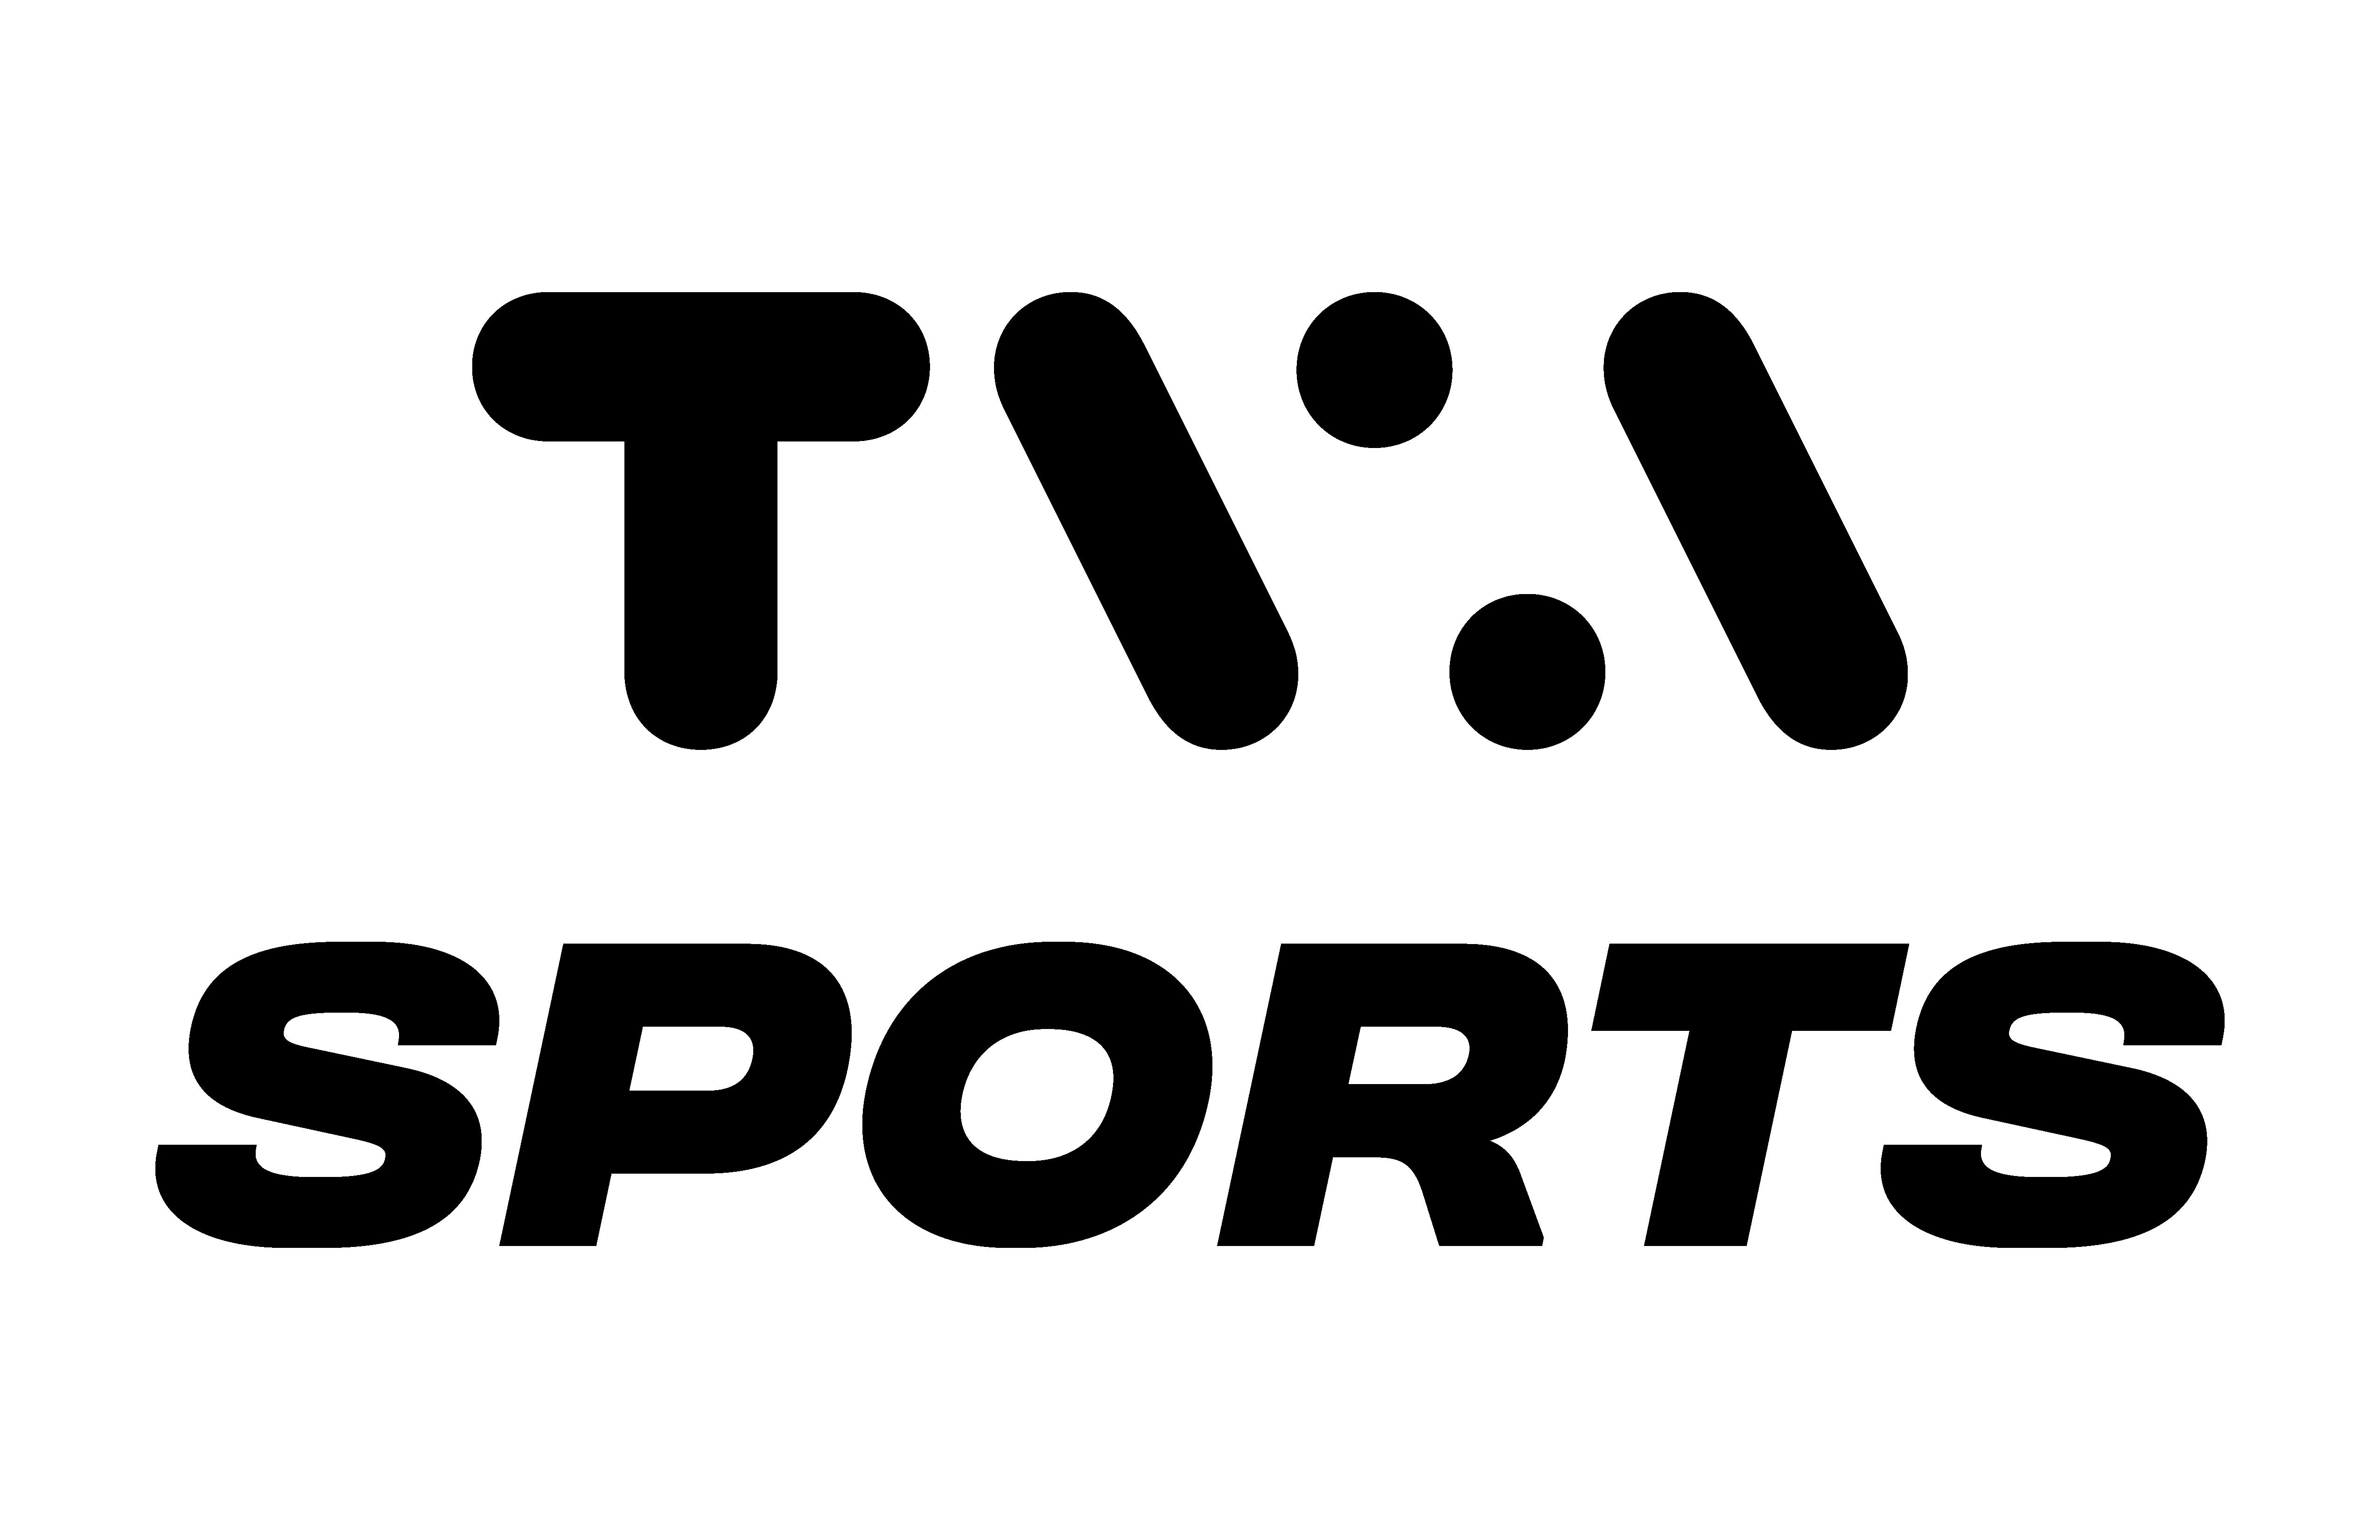 TVA_SPORTS_logo_vertical_noir_rvb.png (157 KB)